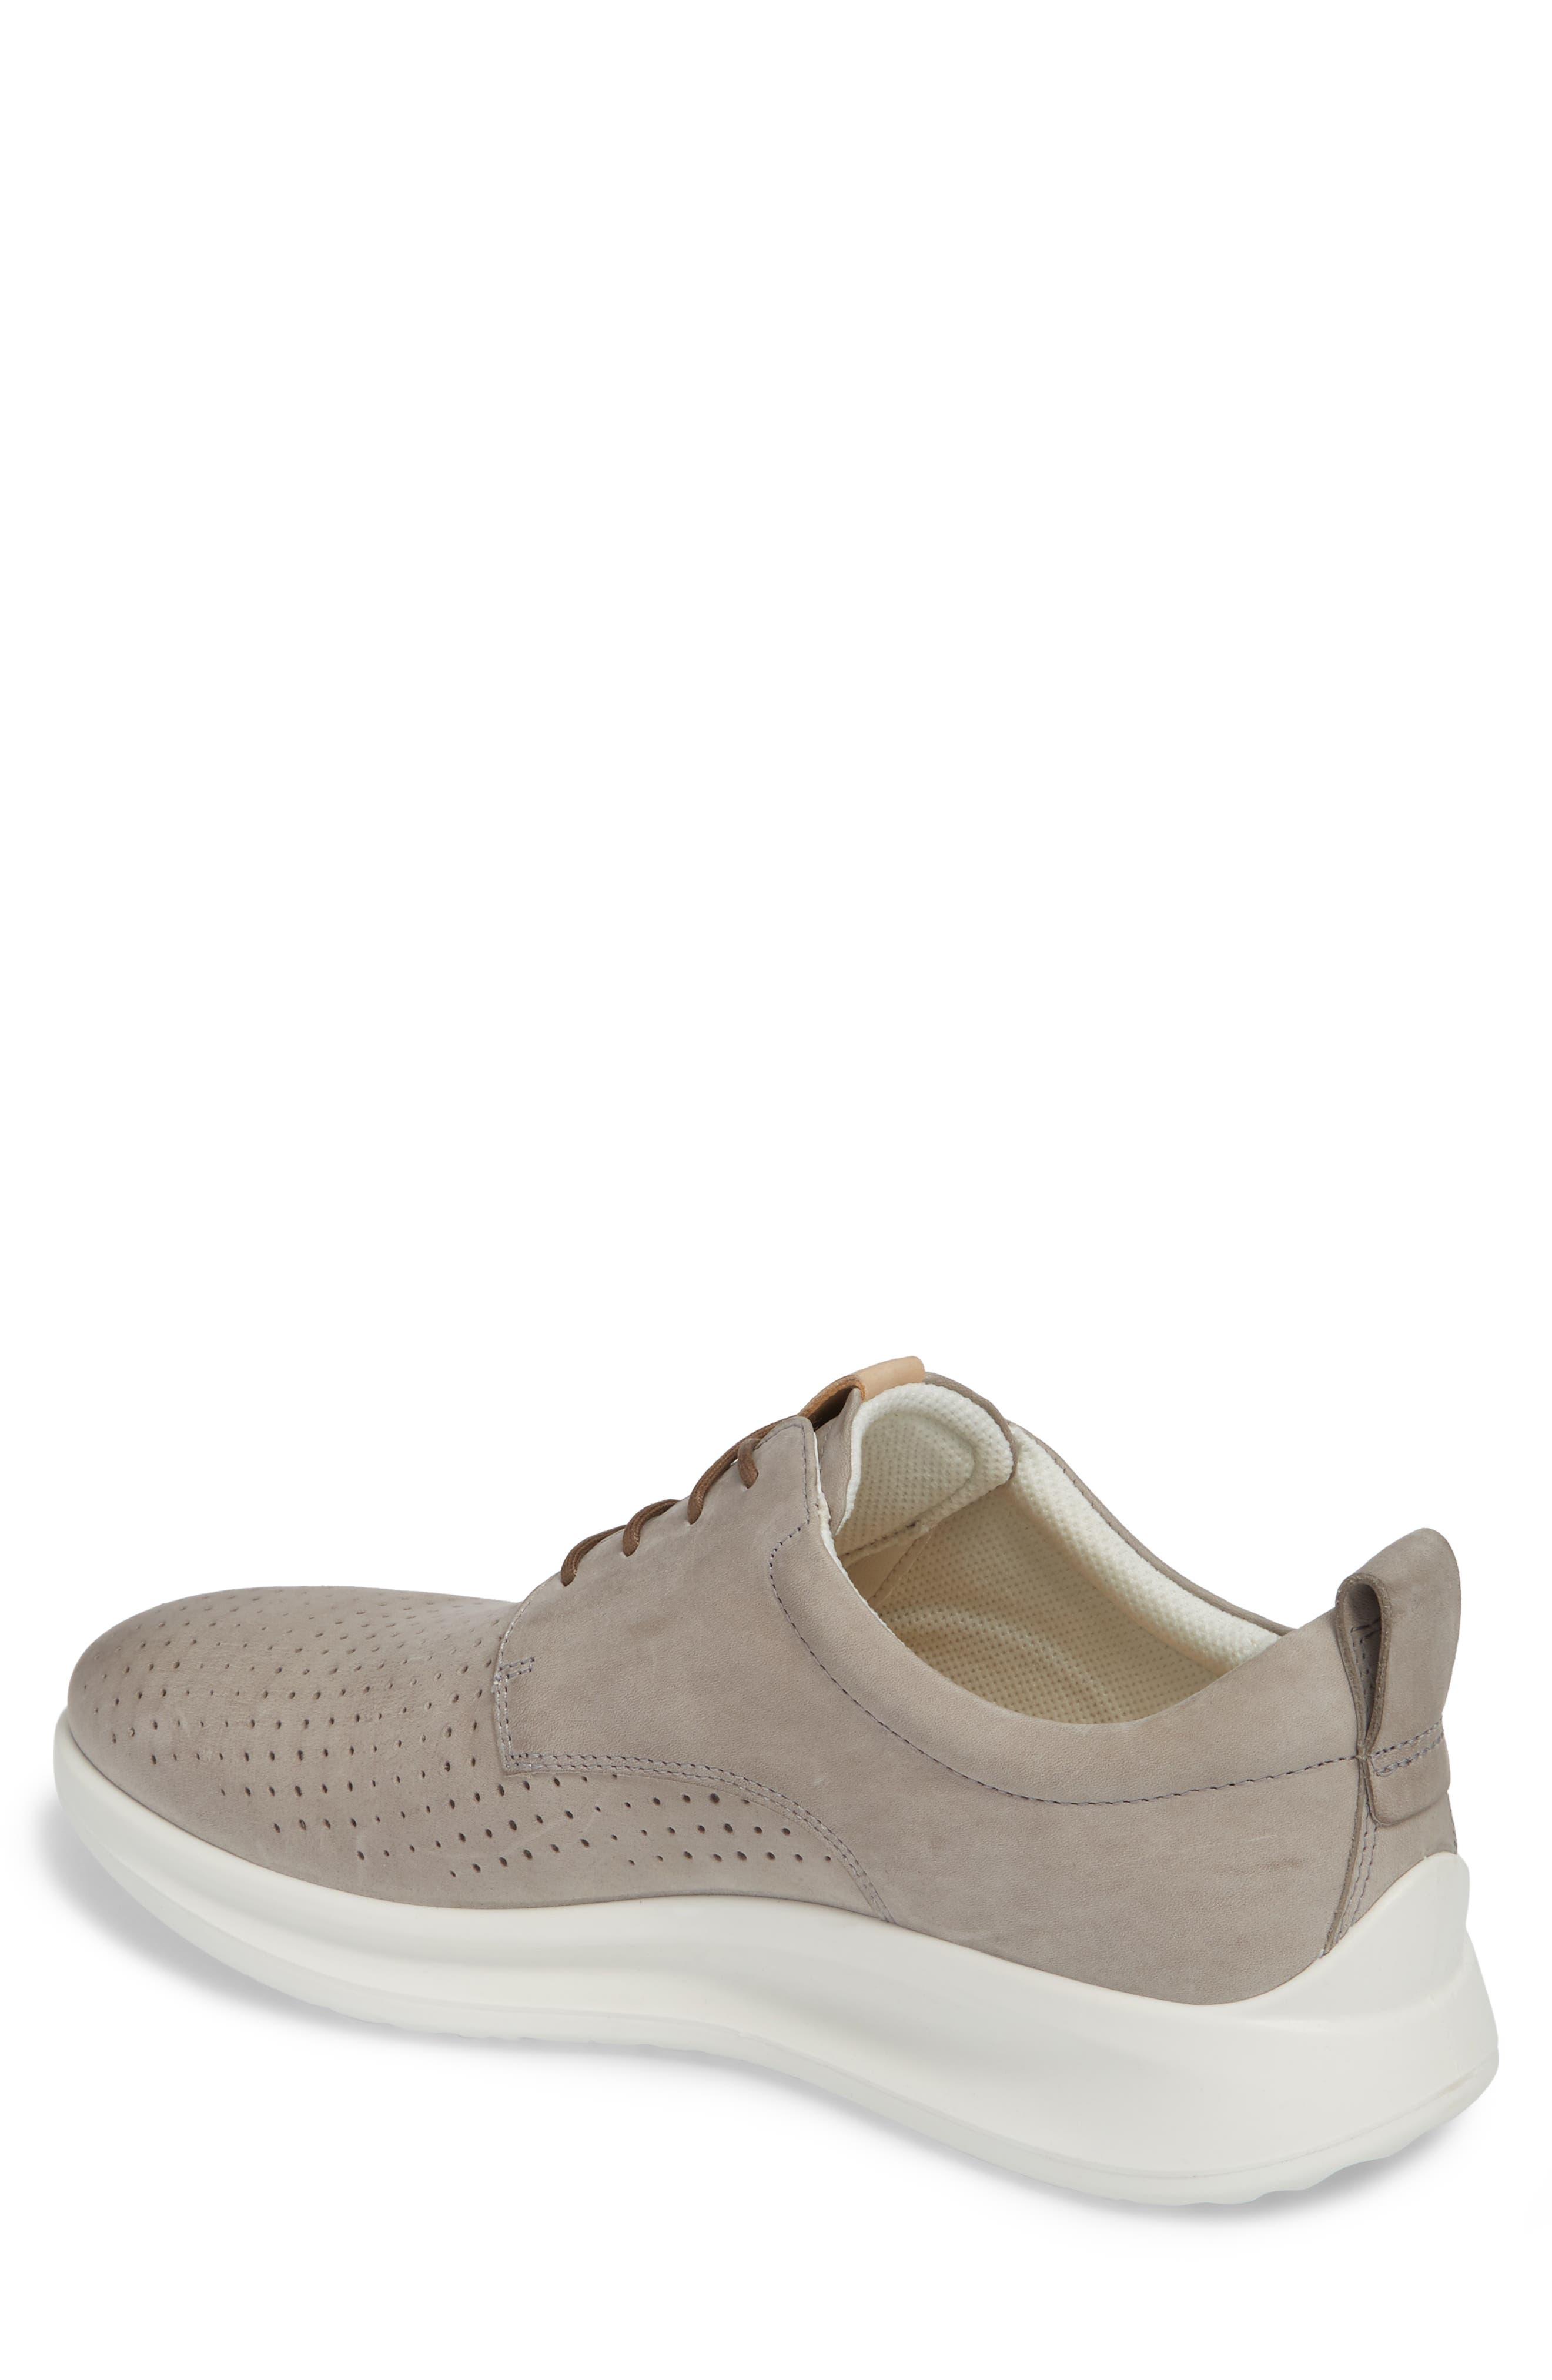 Aquet Sneaker,                             Alternate thumbnail 2, color,                             Moon Rock Leather